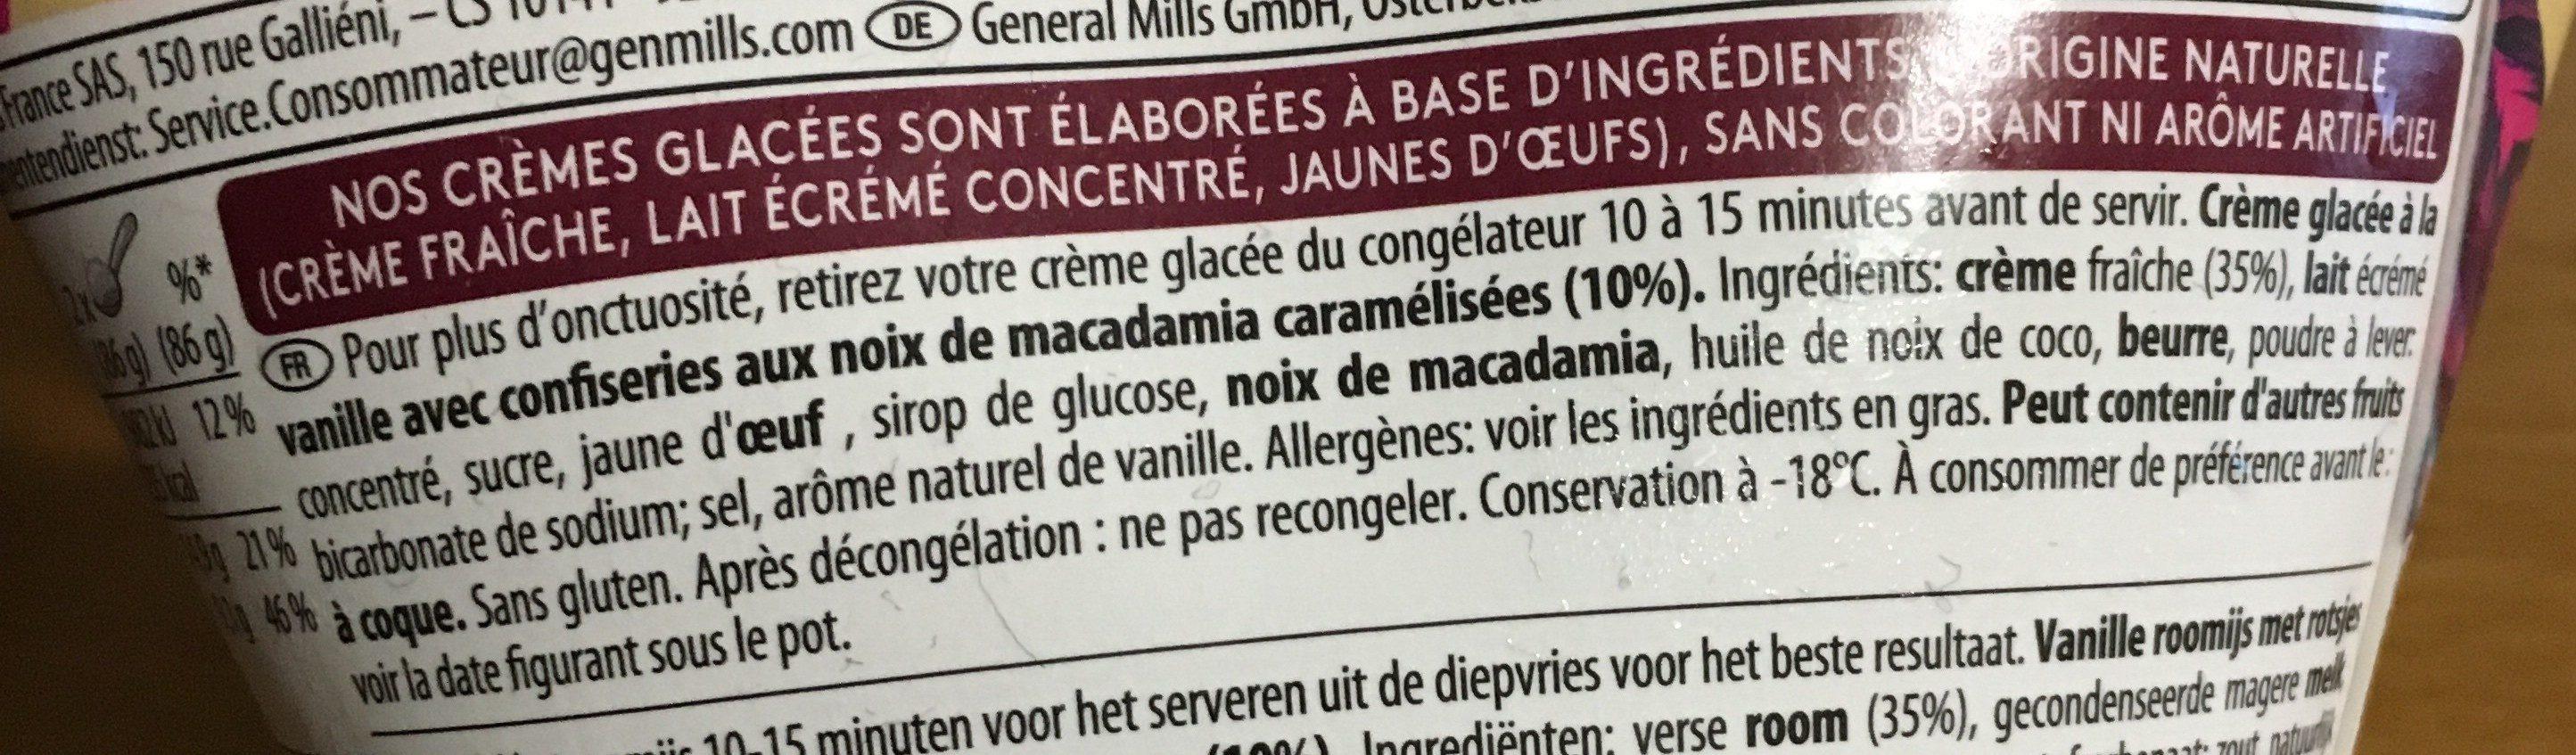 Macadamia nut brittle - Ingrediënten